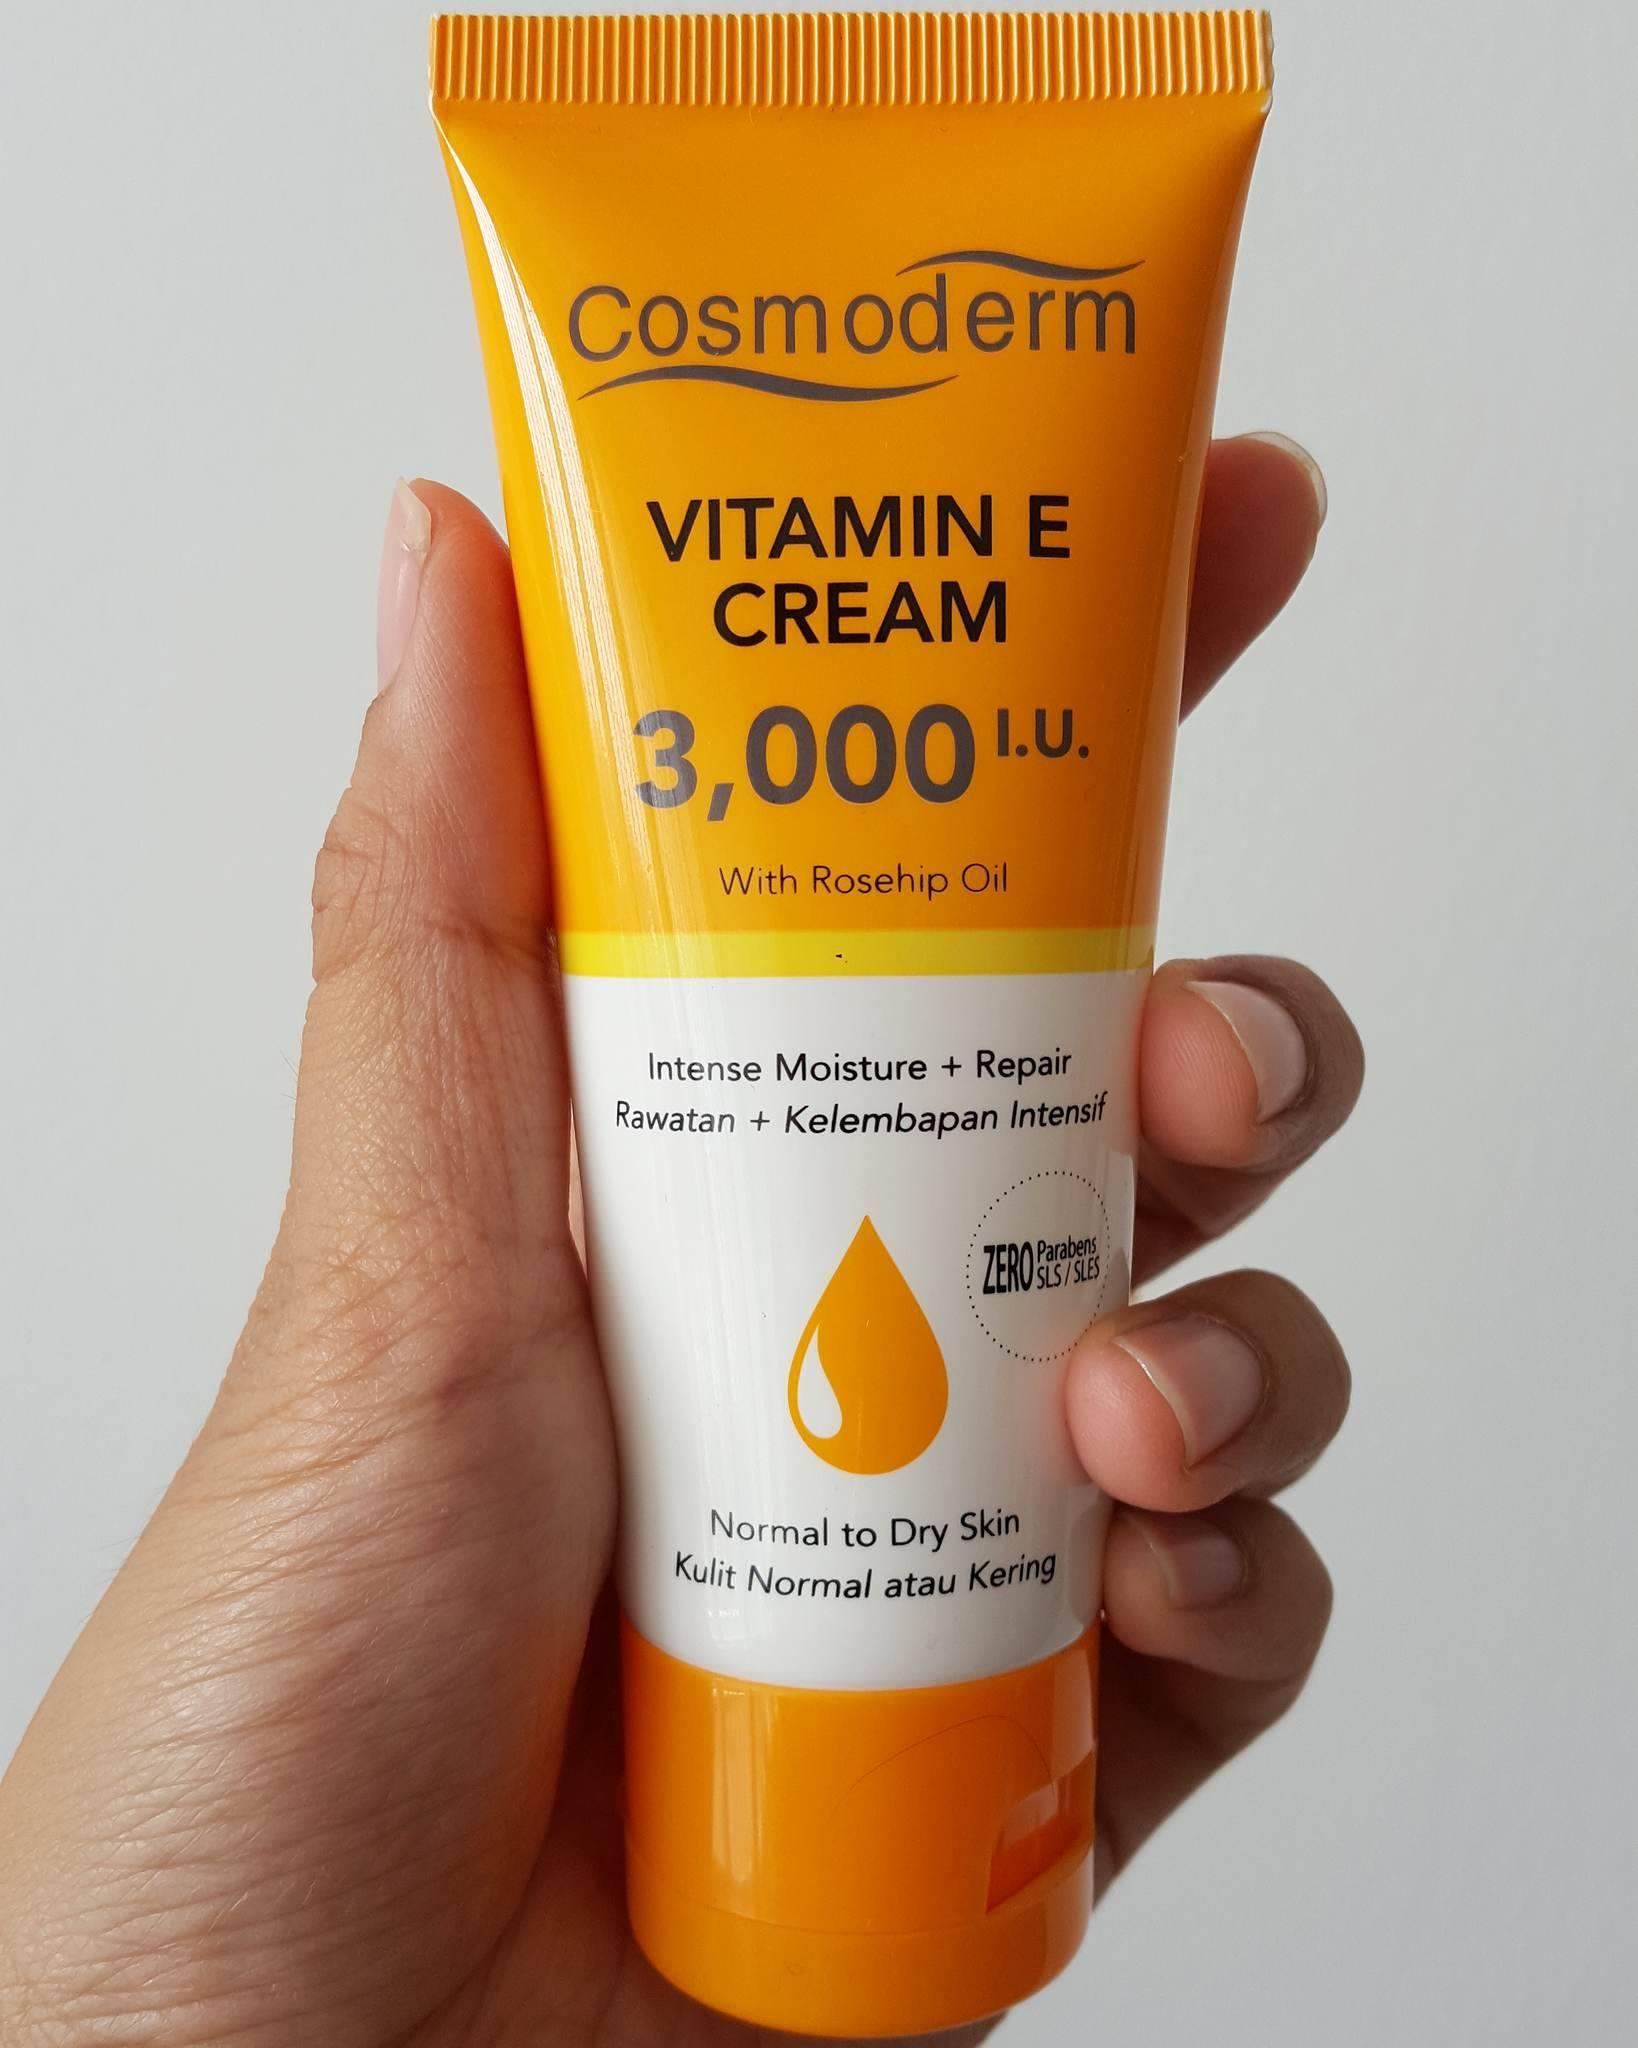 vitamin e CREAM cosmoderm untuk kulit kering